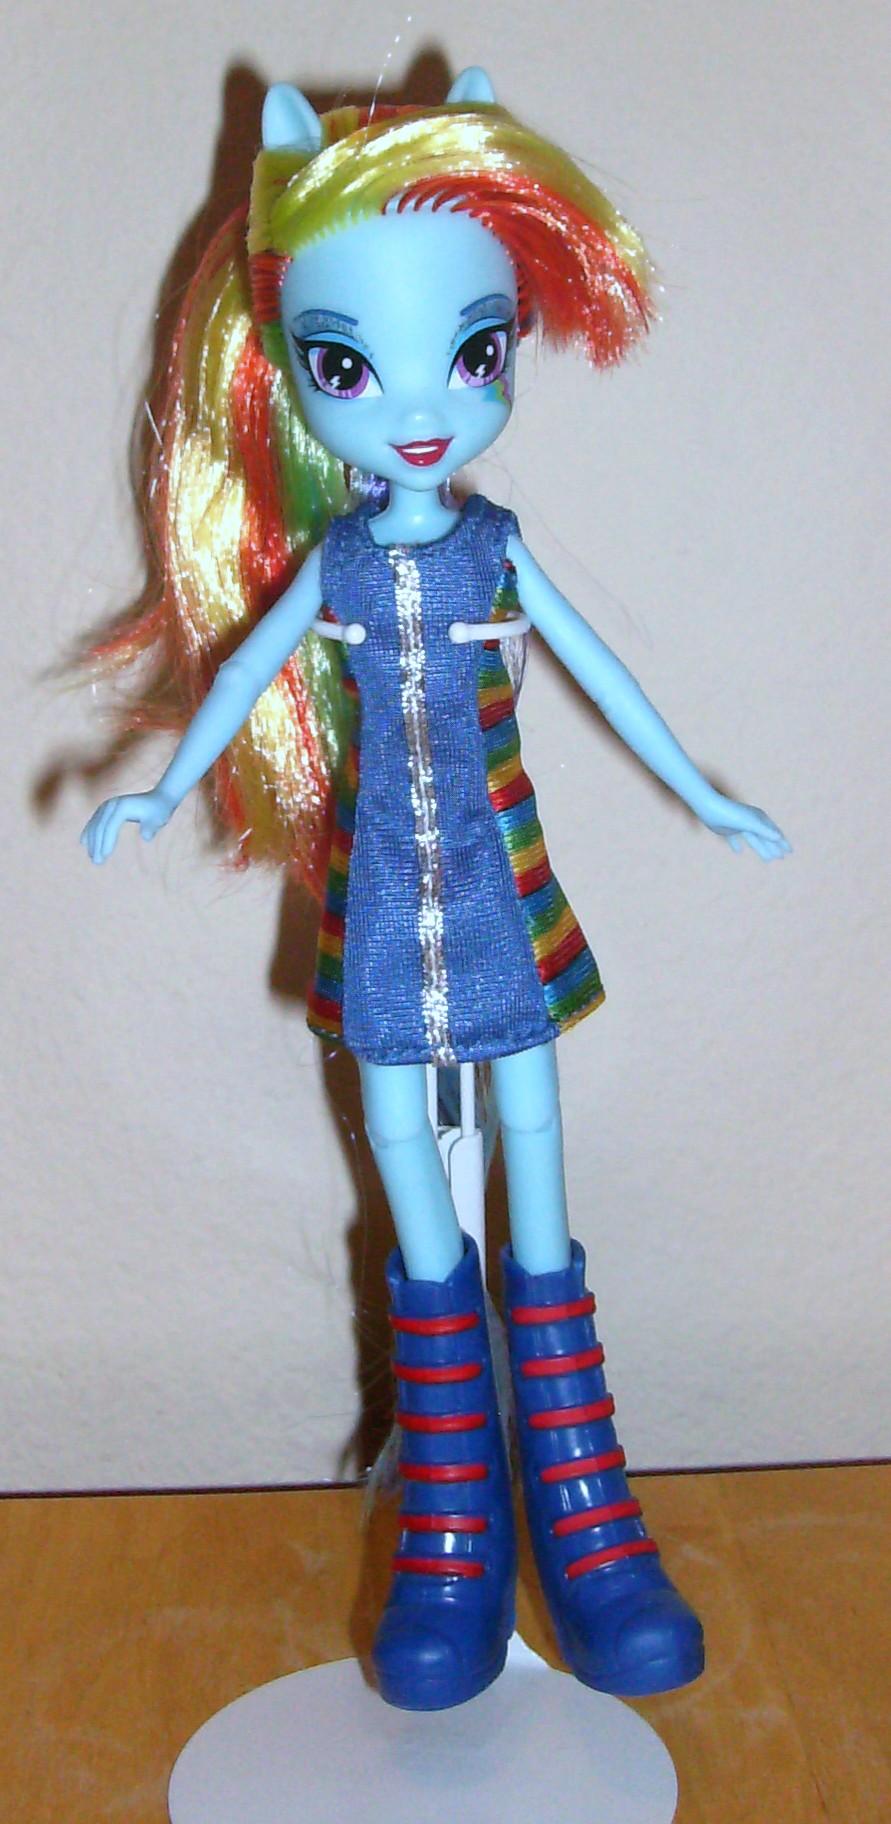 Rainbow Dash by Hasbro